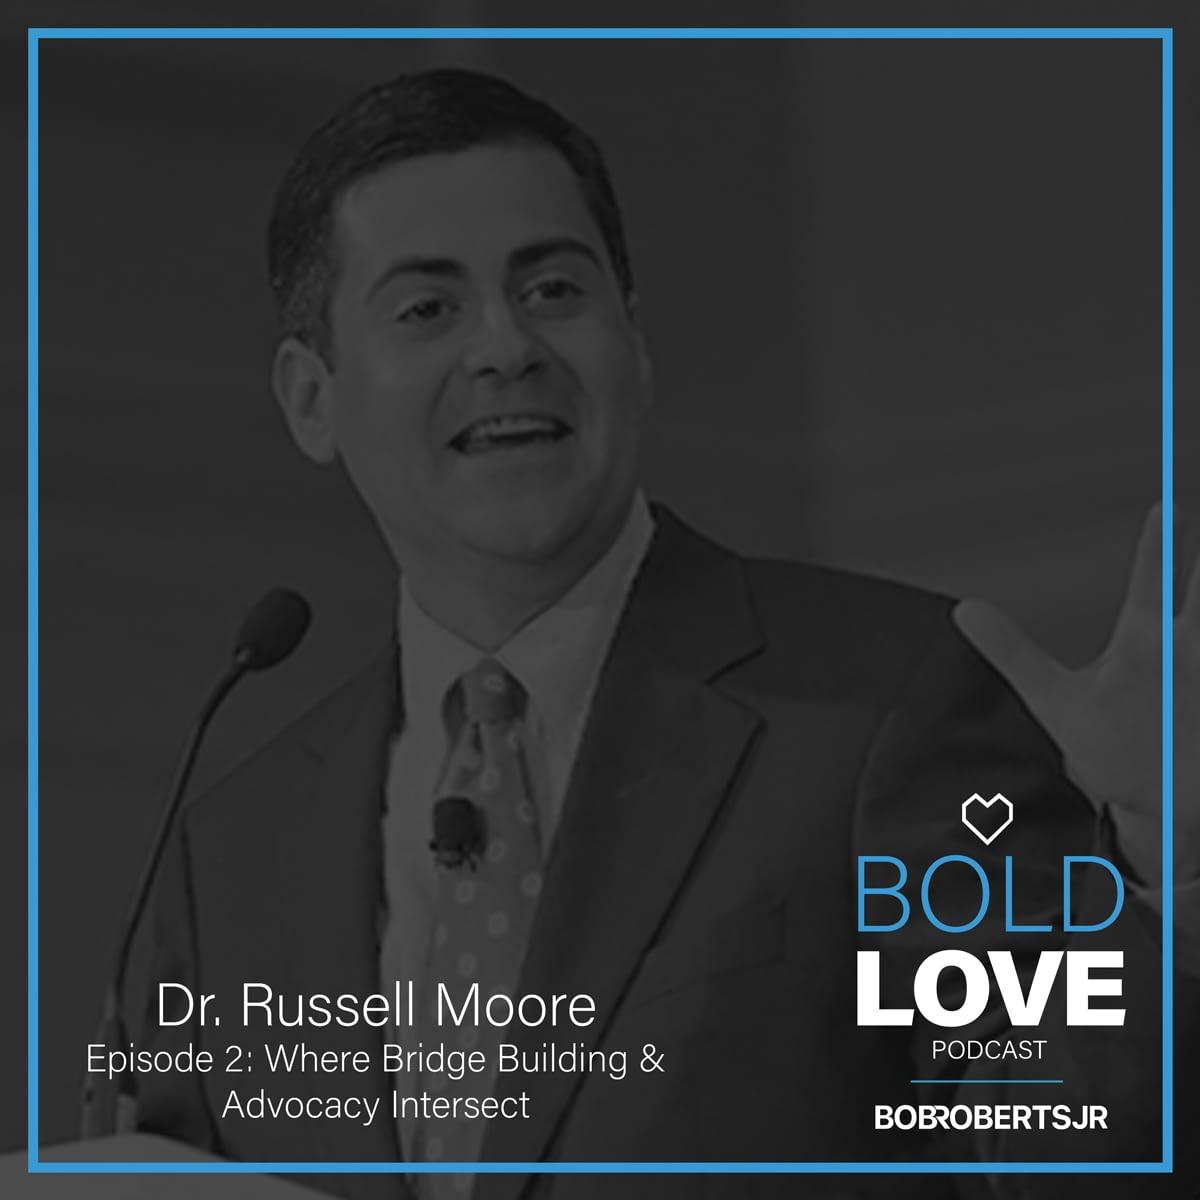 S1E2 – Dr. Russell Moore   Where Bridge Building & Advocacy Intersect